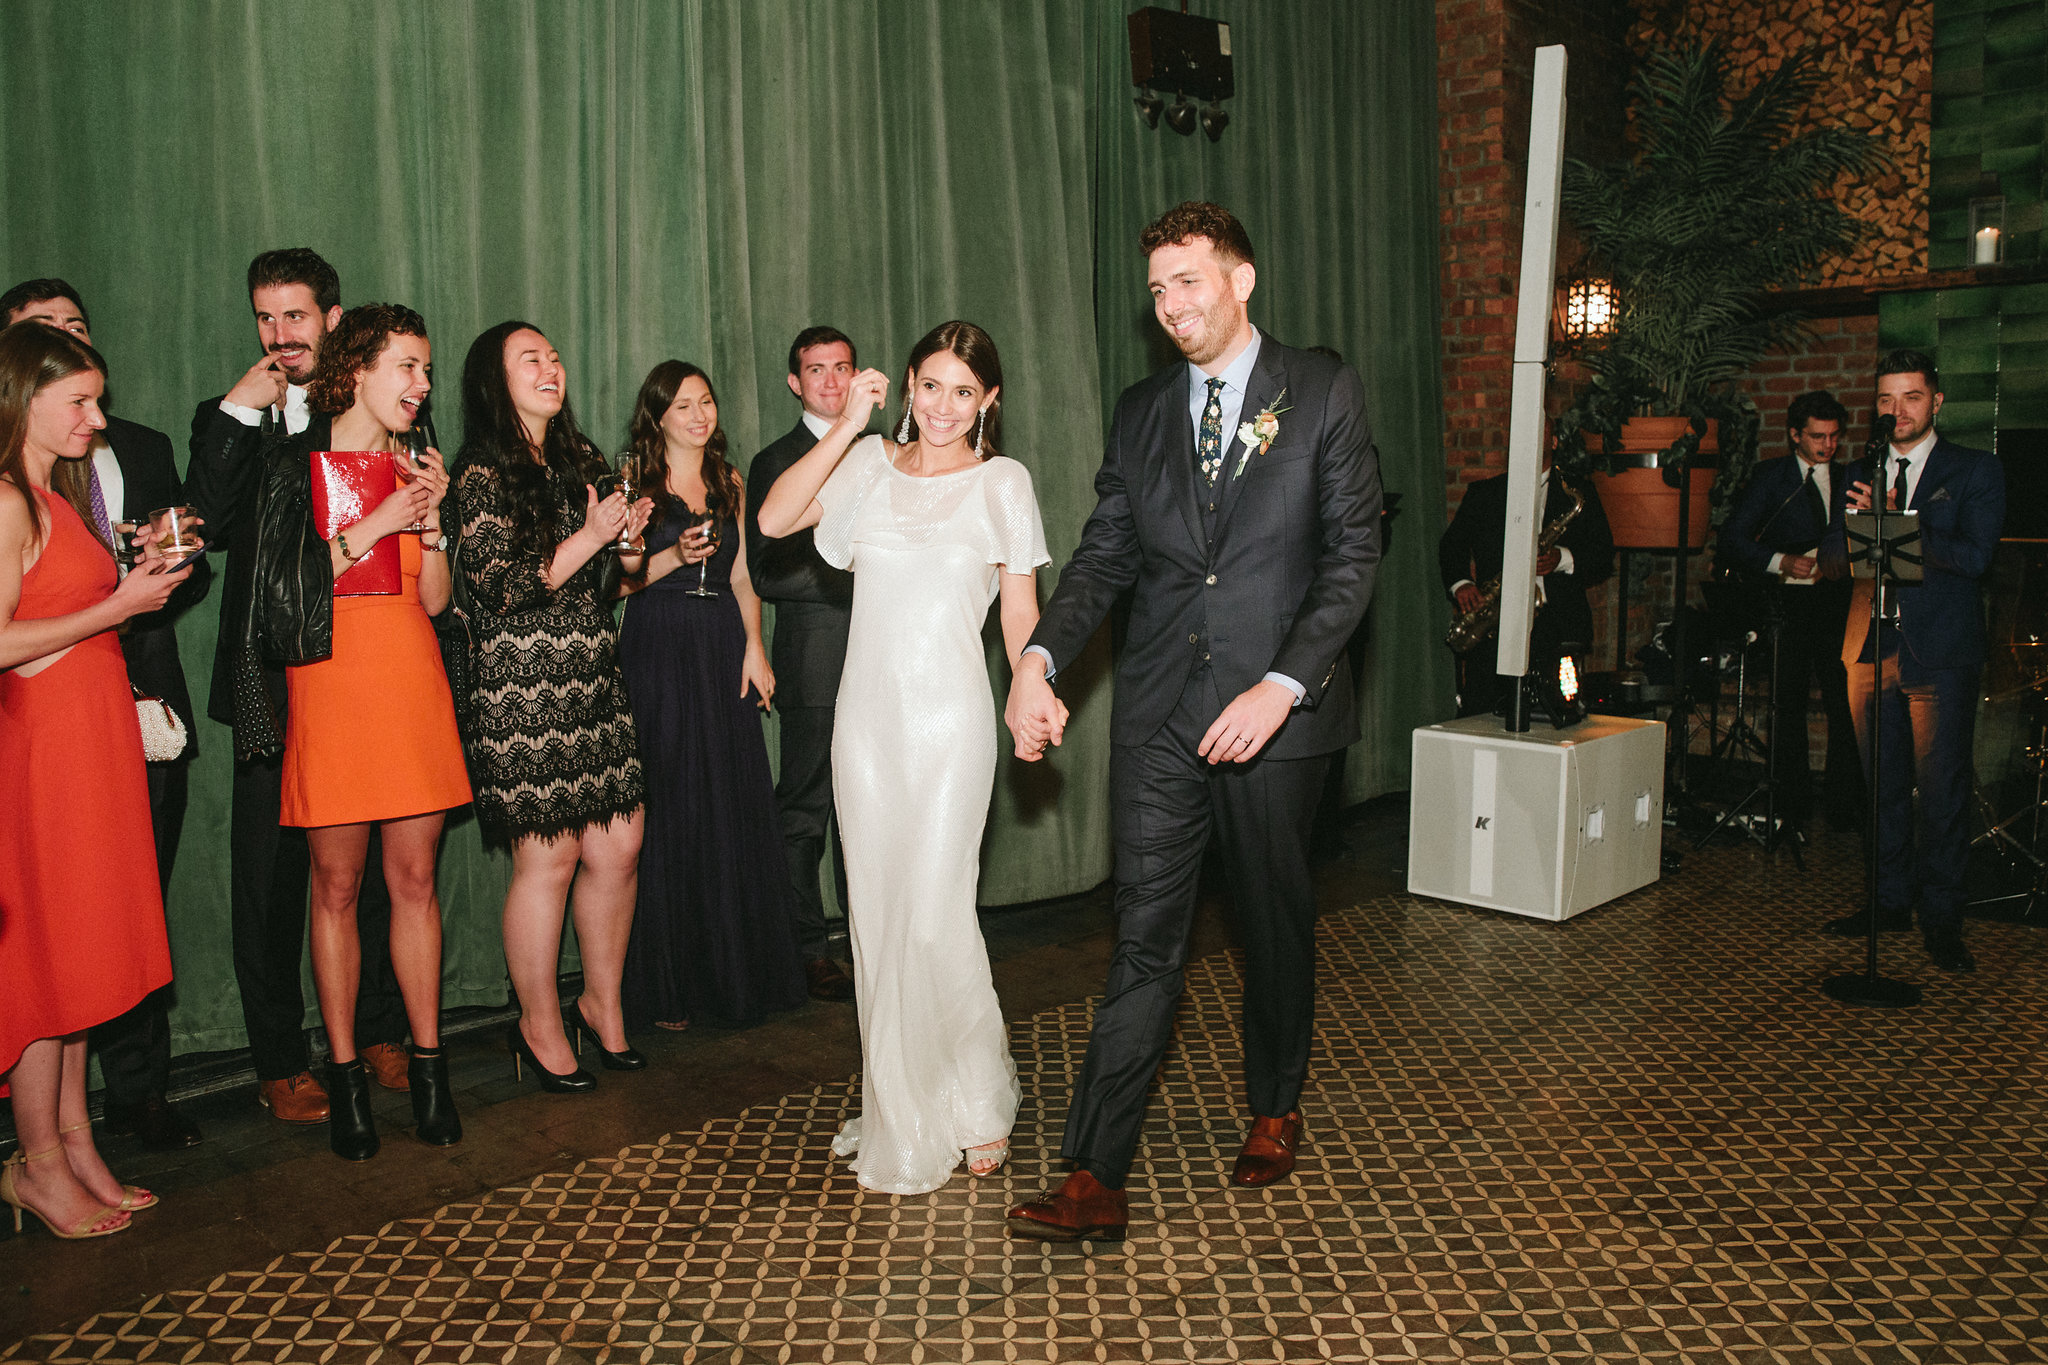 bowery-hotel-wedding-jove-meyer-events-043.jpg